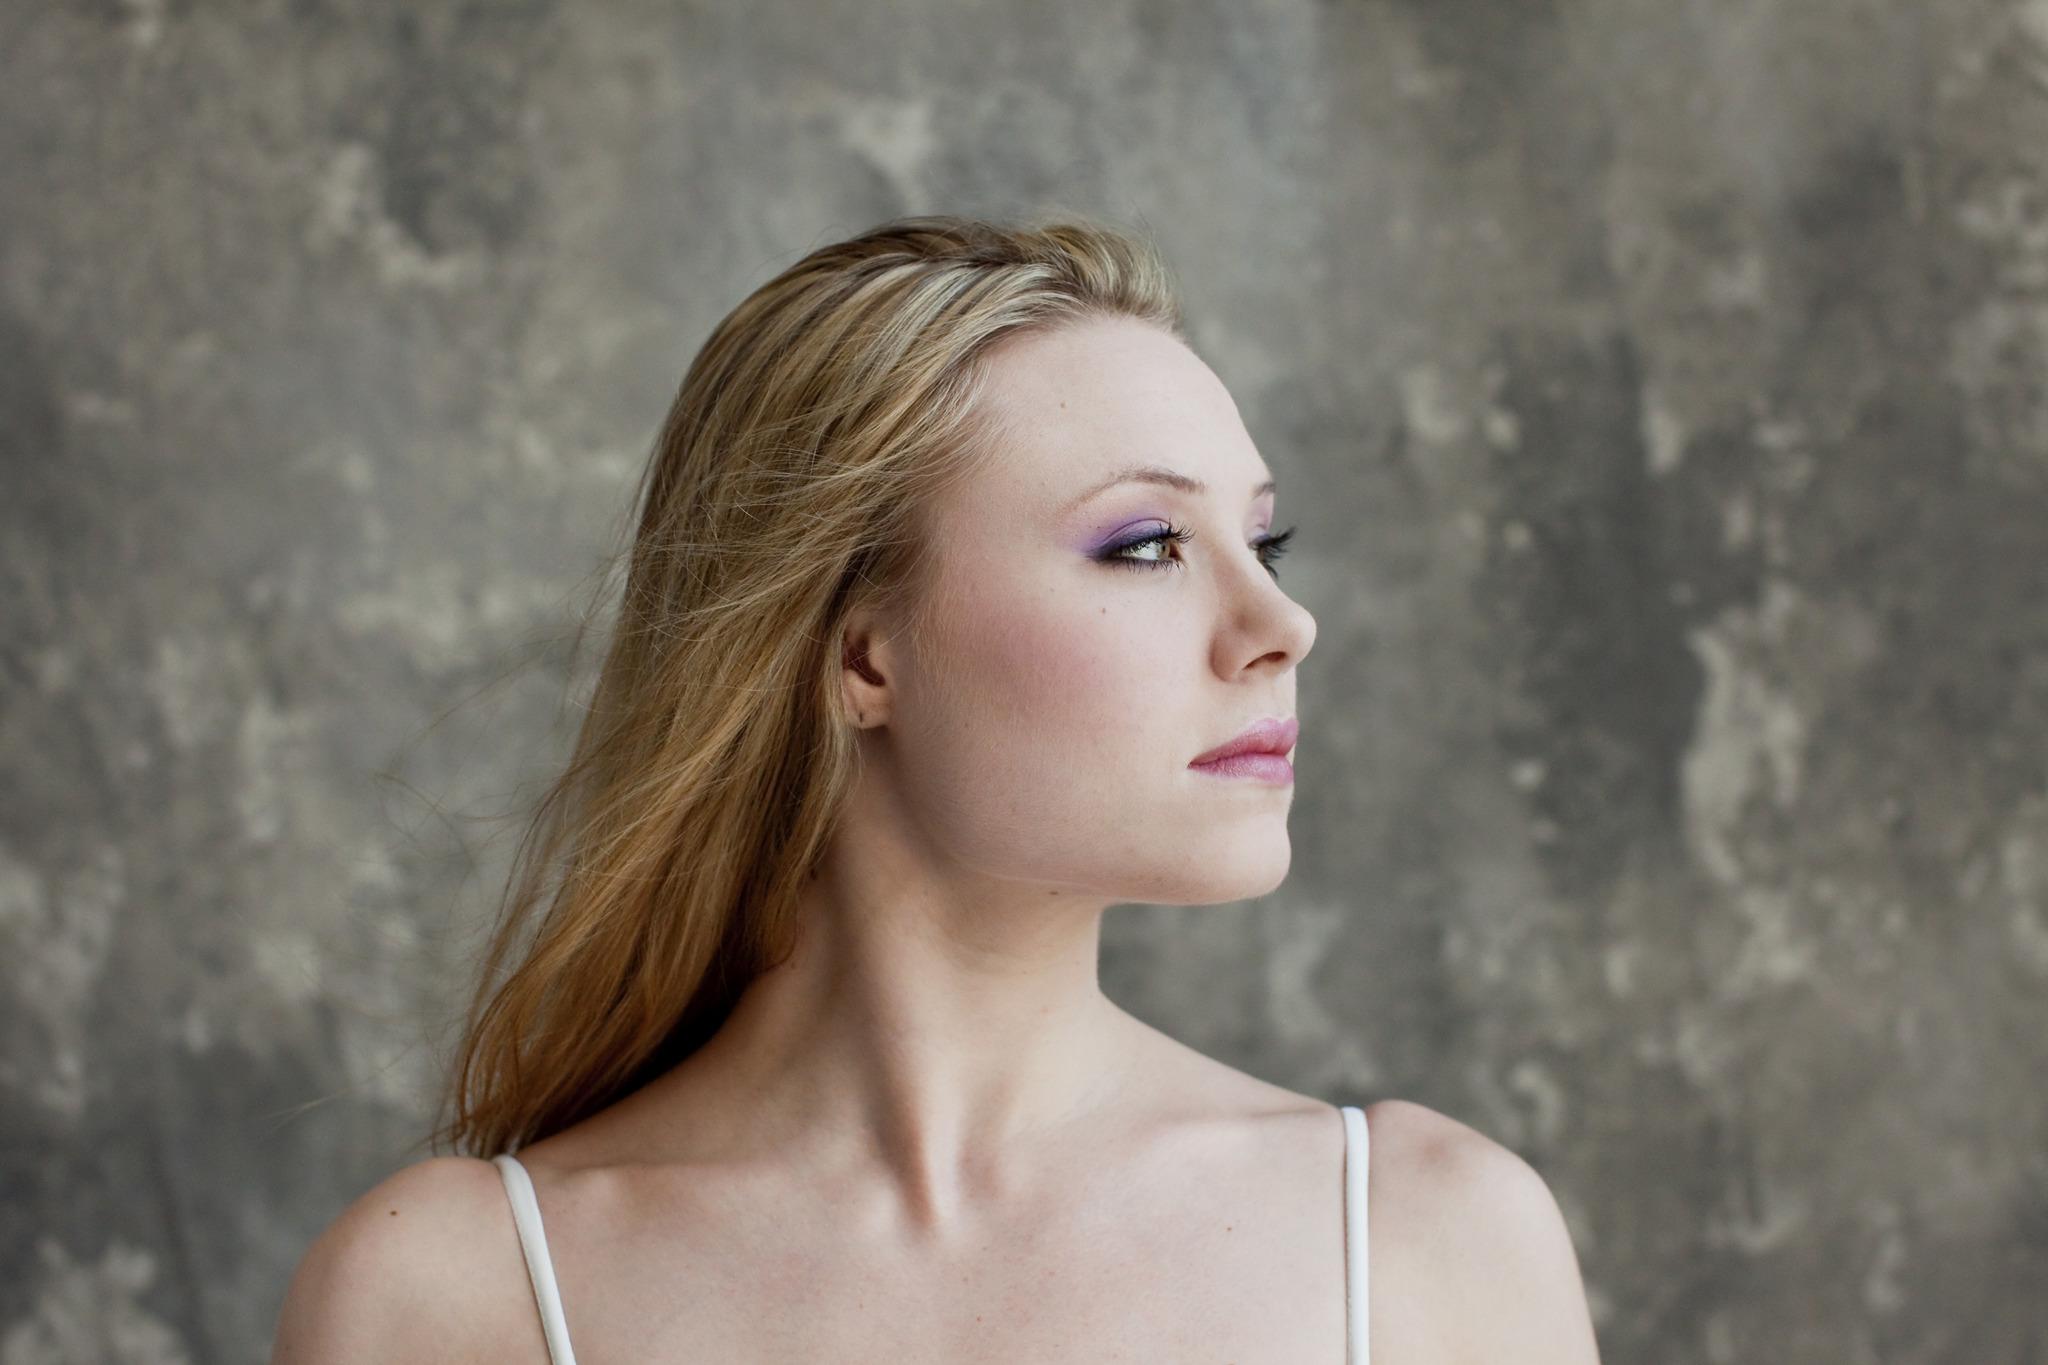 Sara Mearns